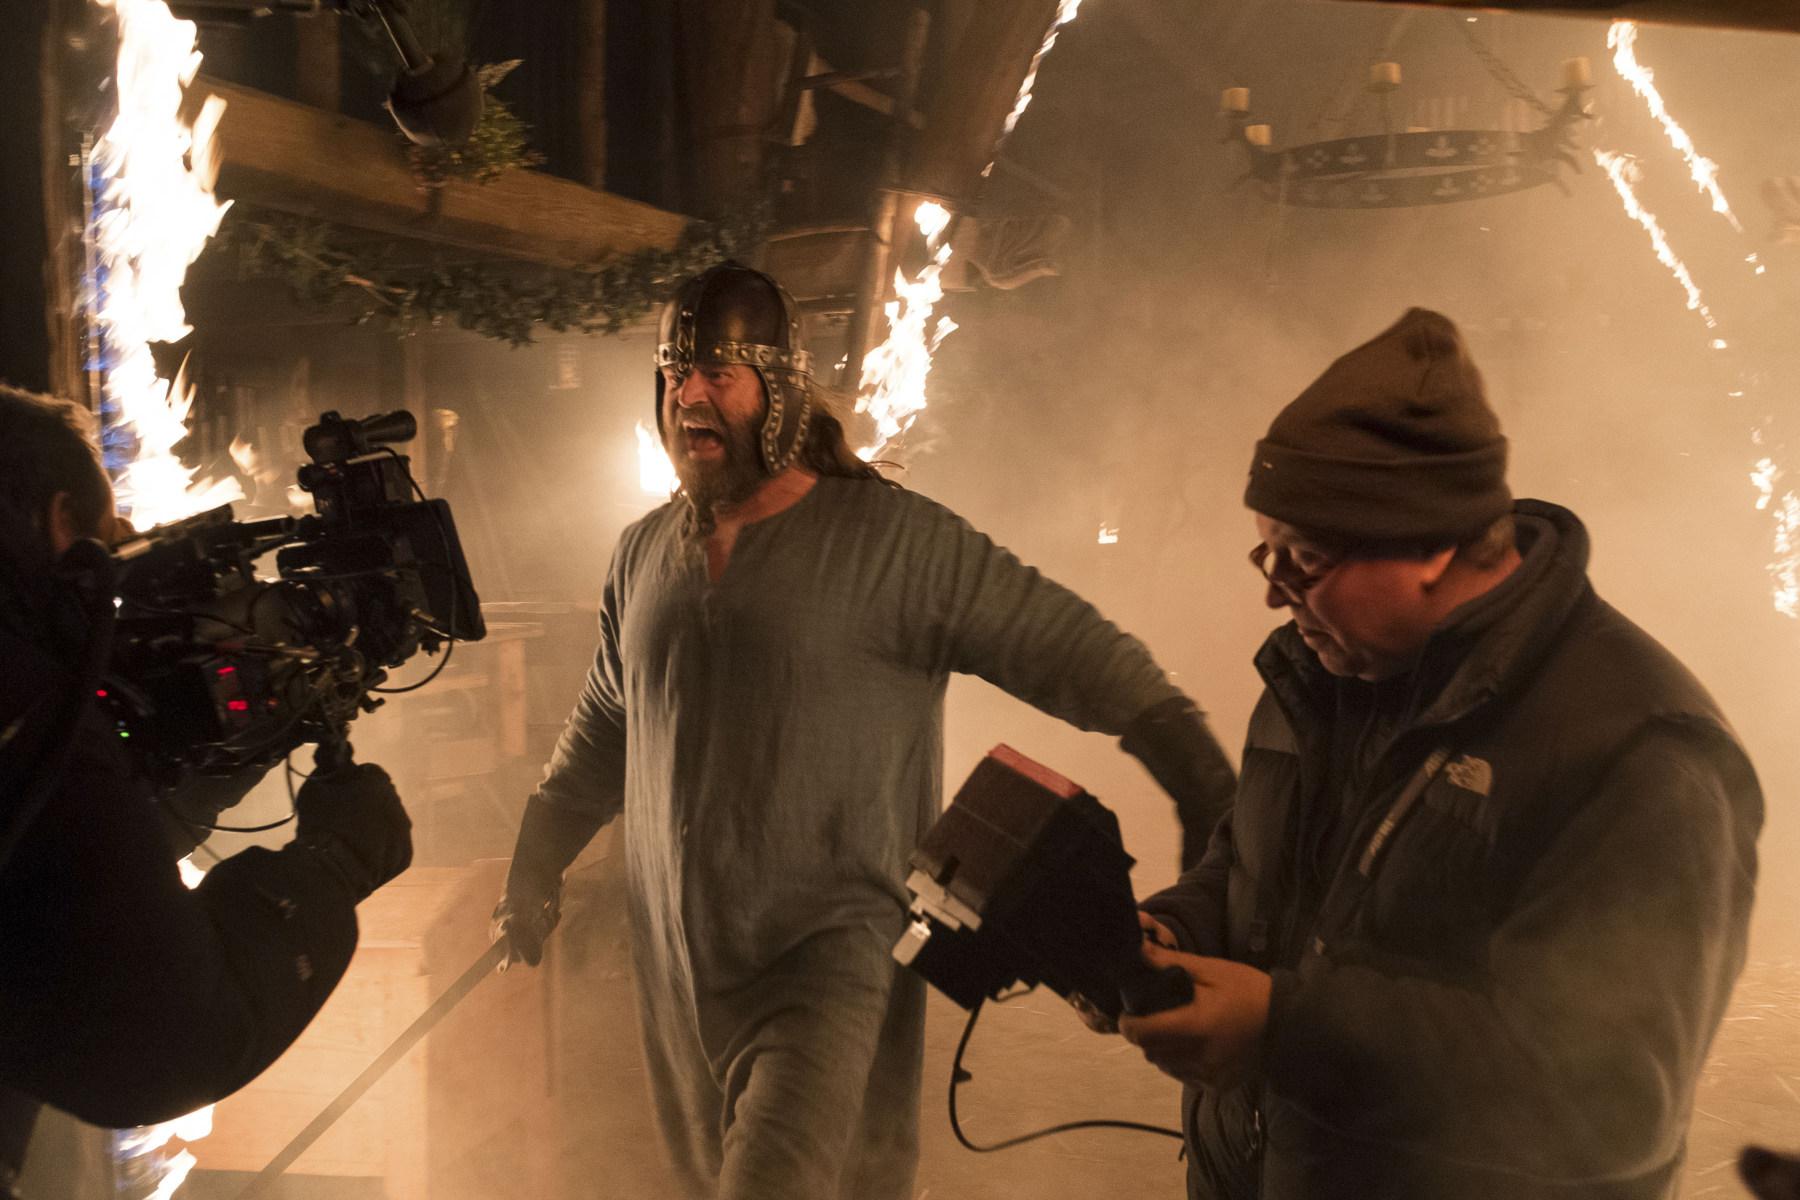 Peter Gantzler in The Last Kingdom (2015) Behind the Scenes